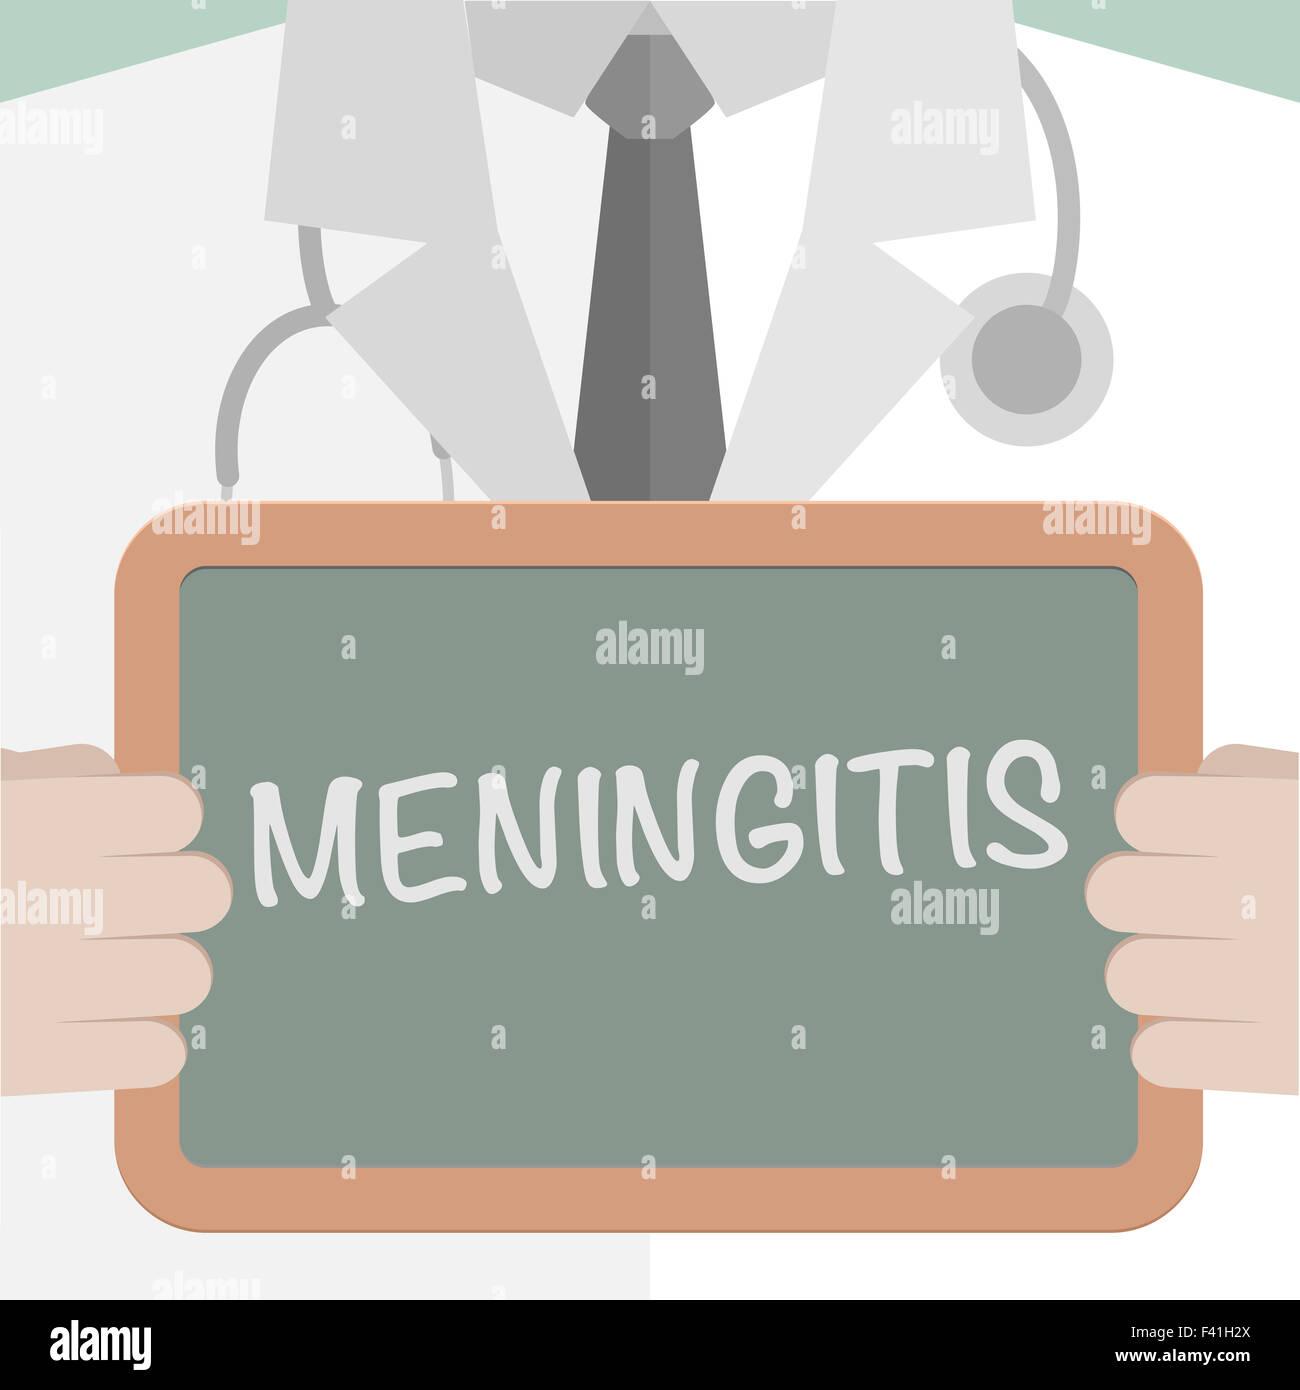 Medical Board Meningitis - Stock Image